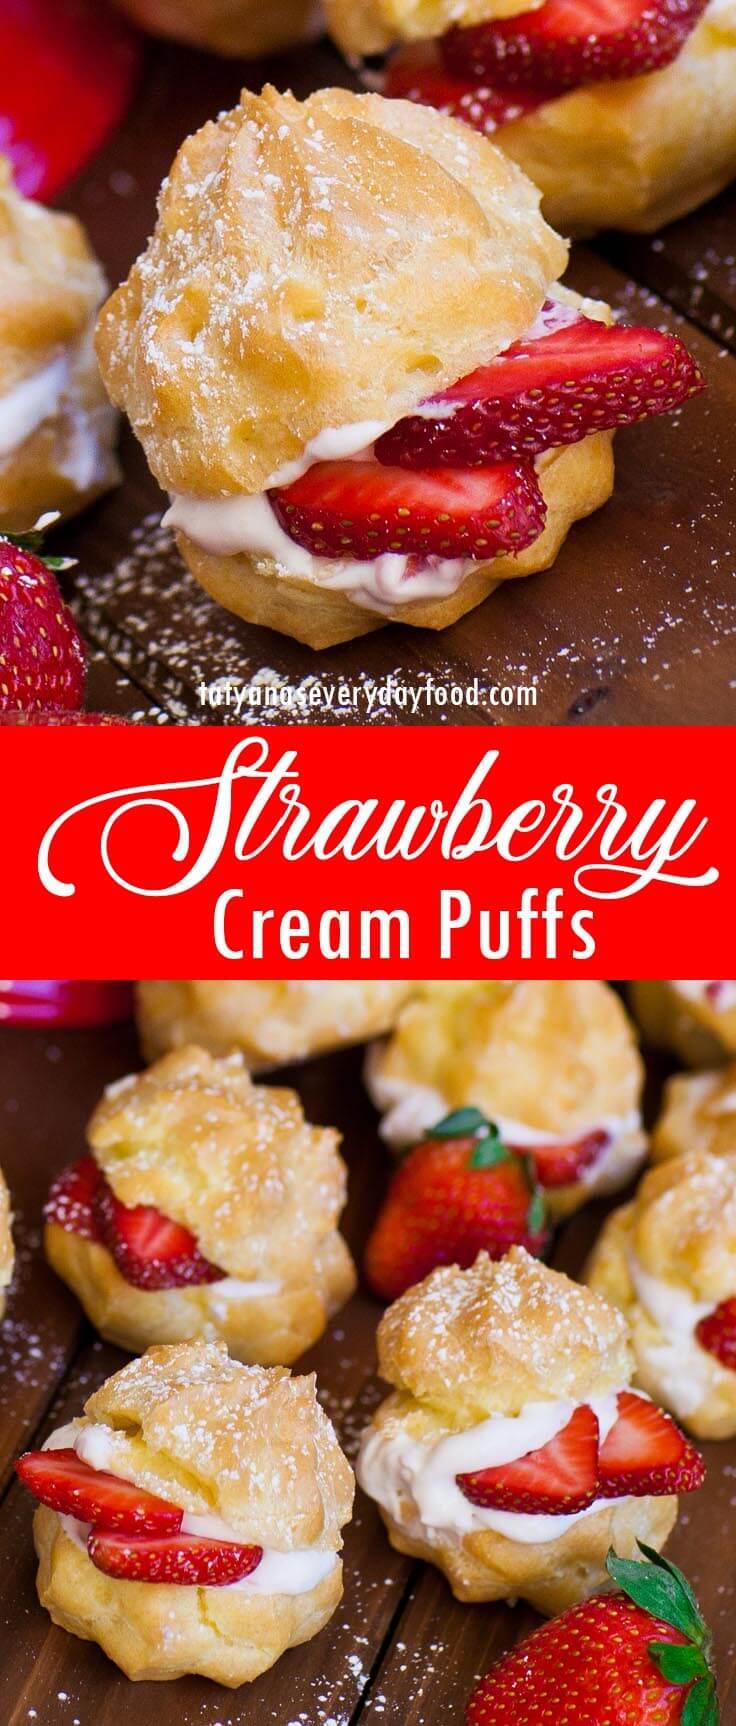 Strawberry Cream Puffs video recipe